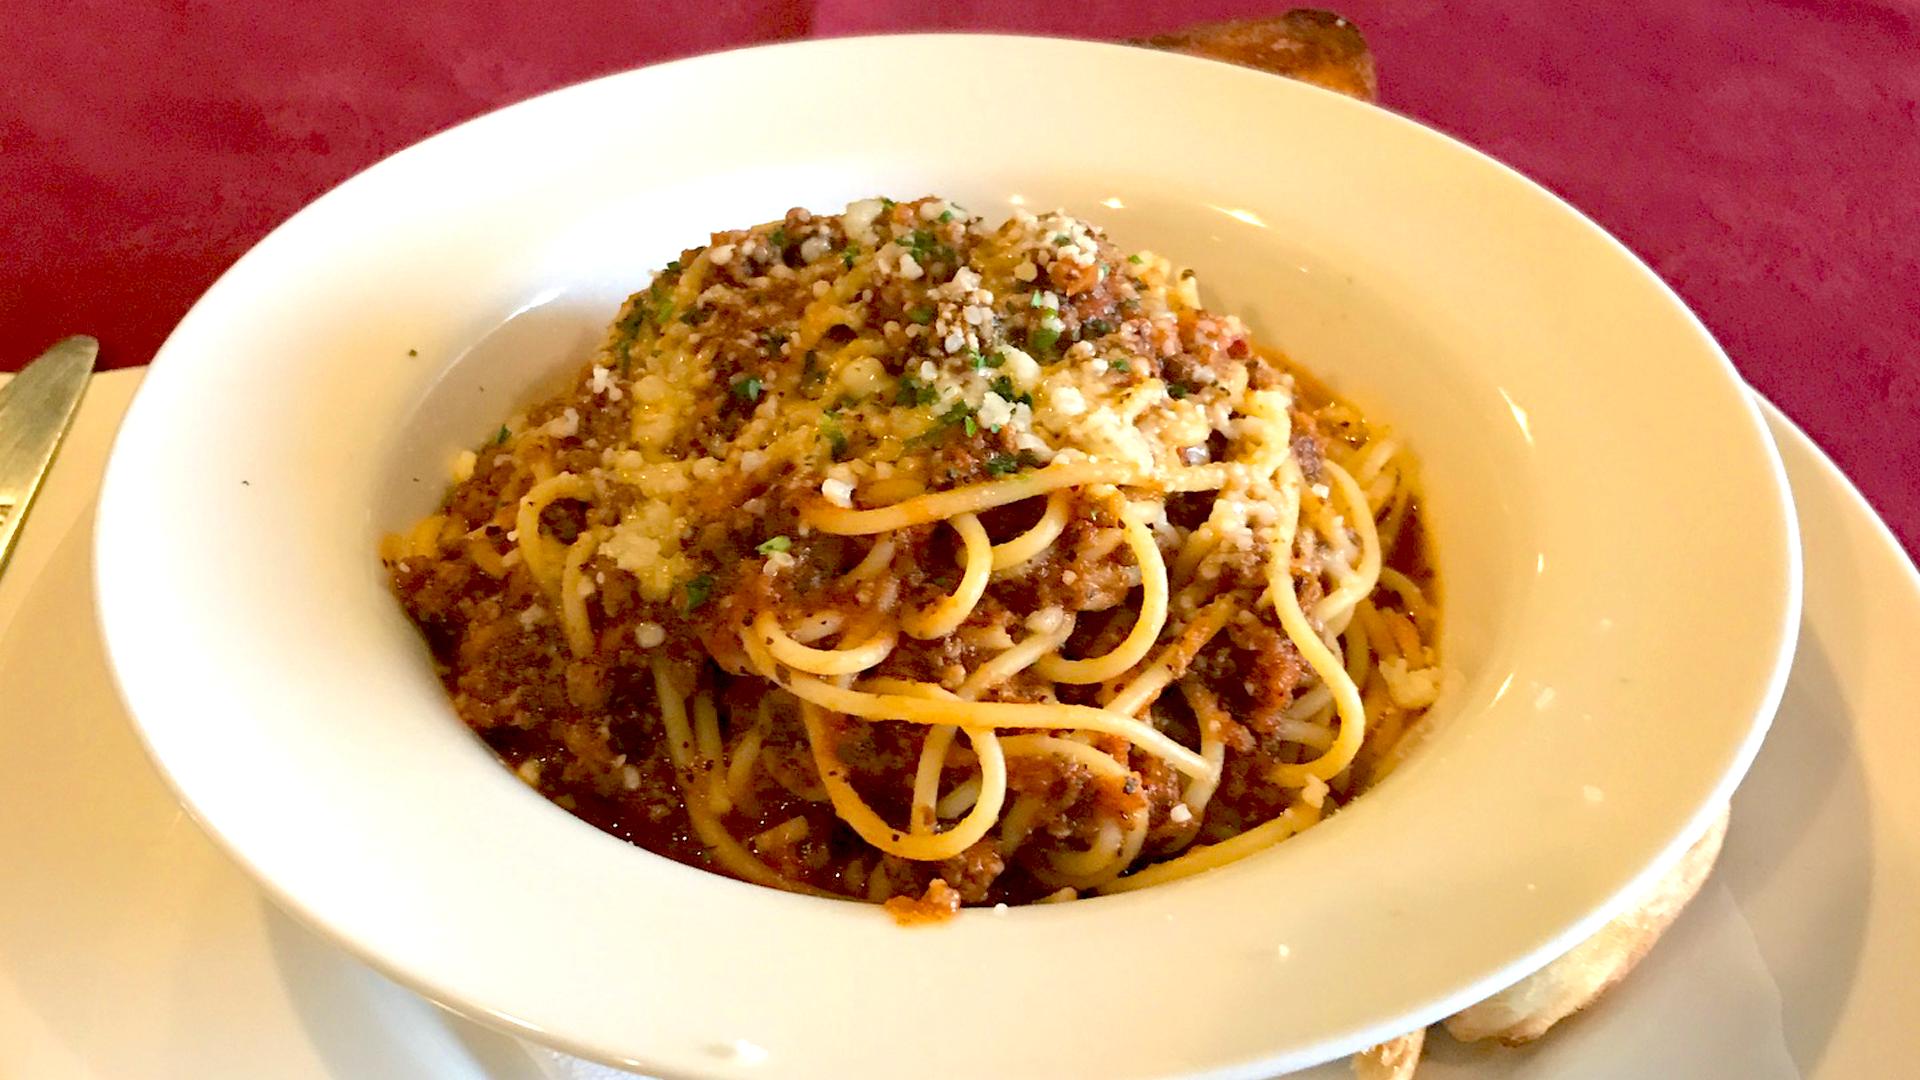 Dine-in Pasta night